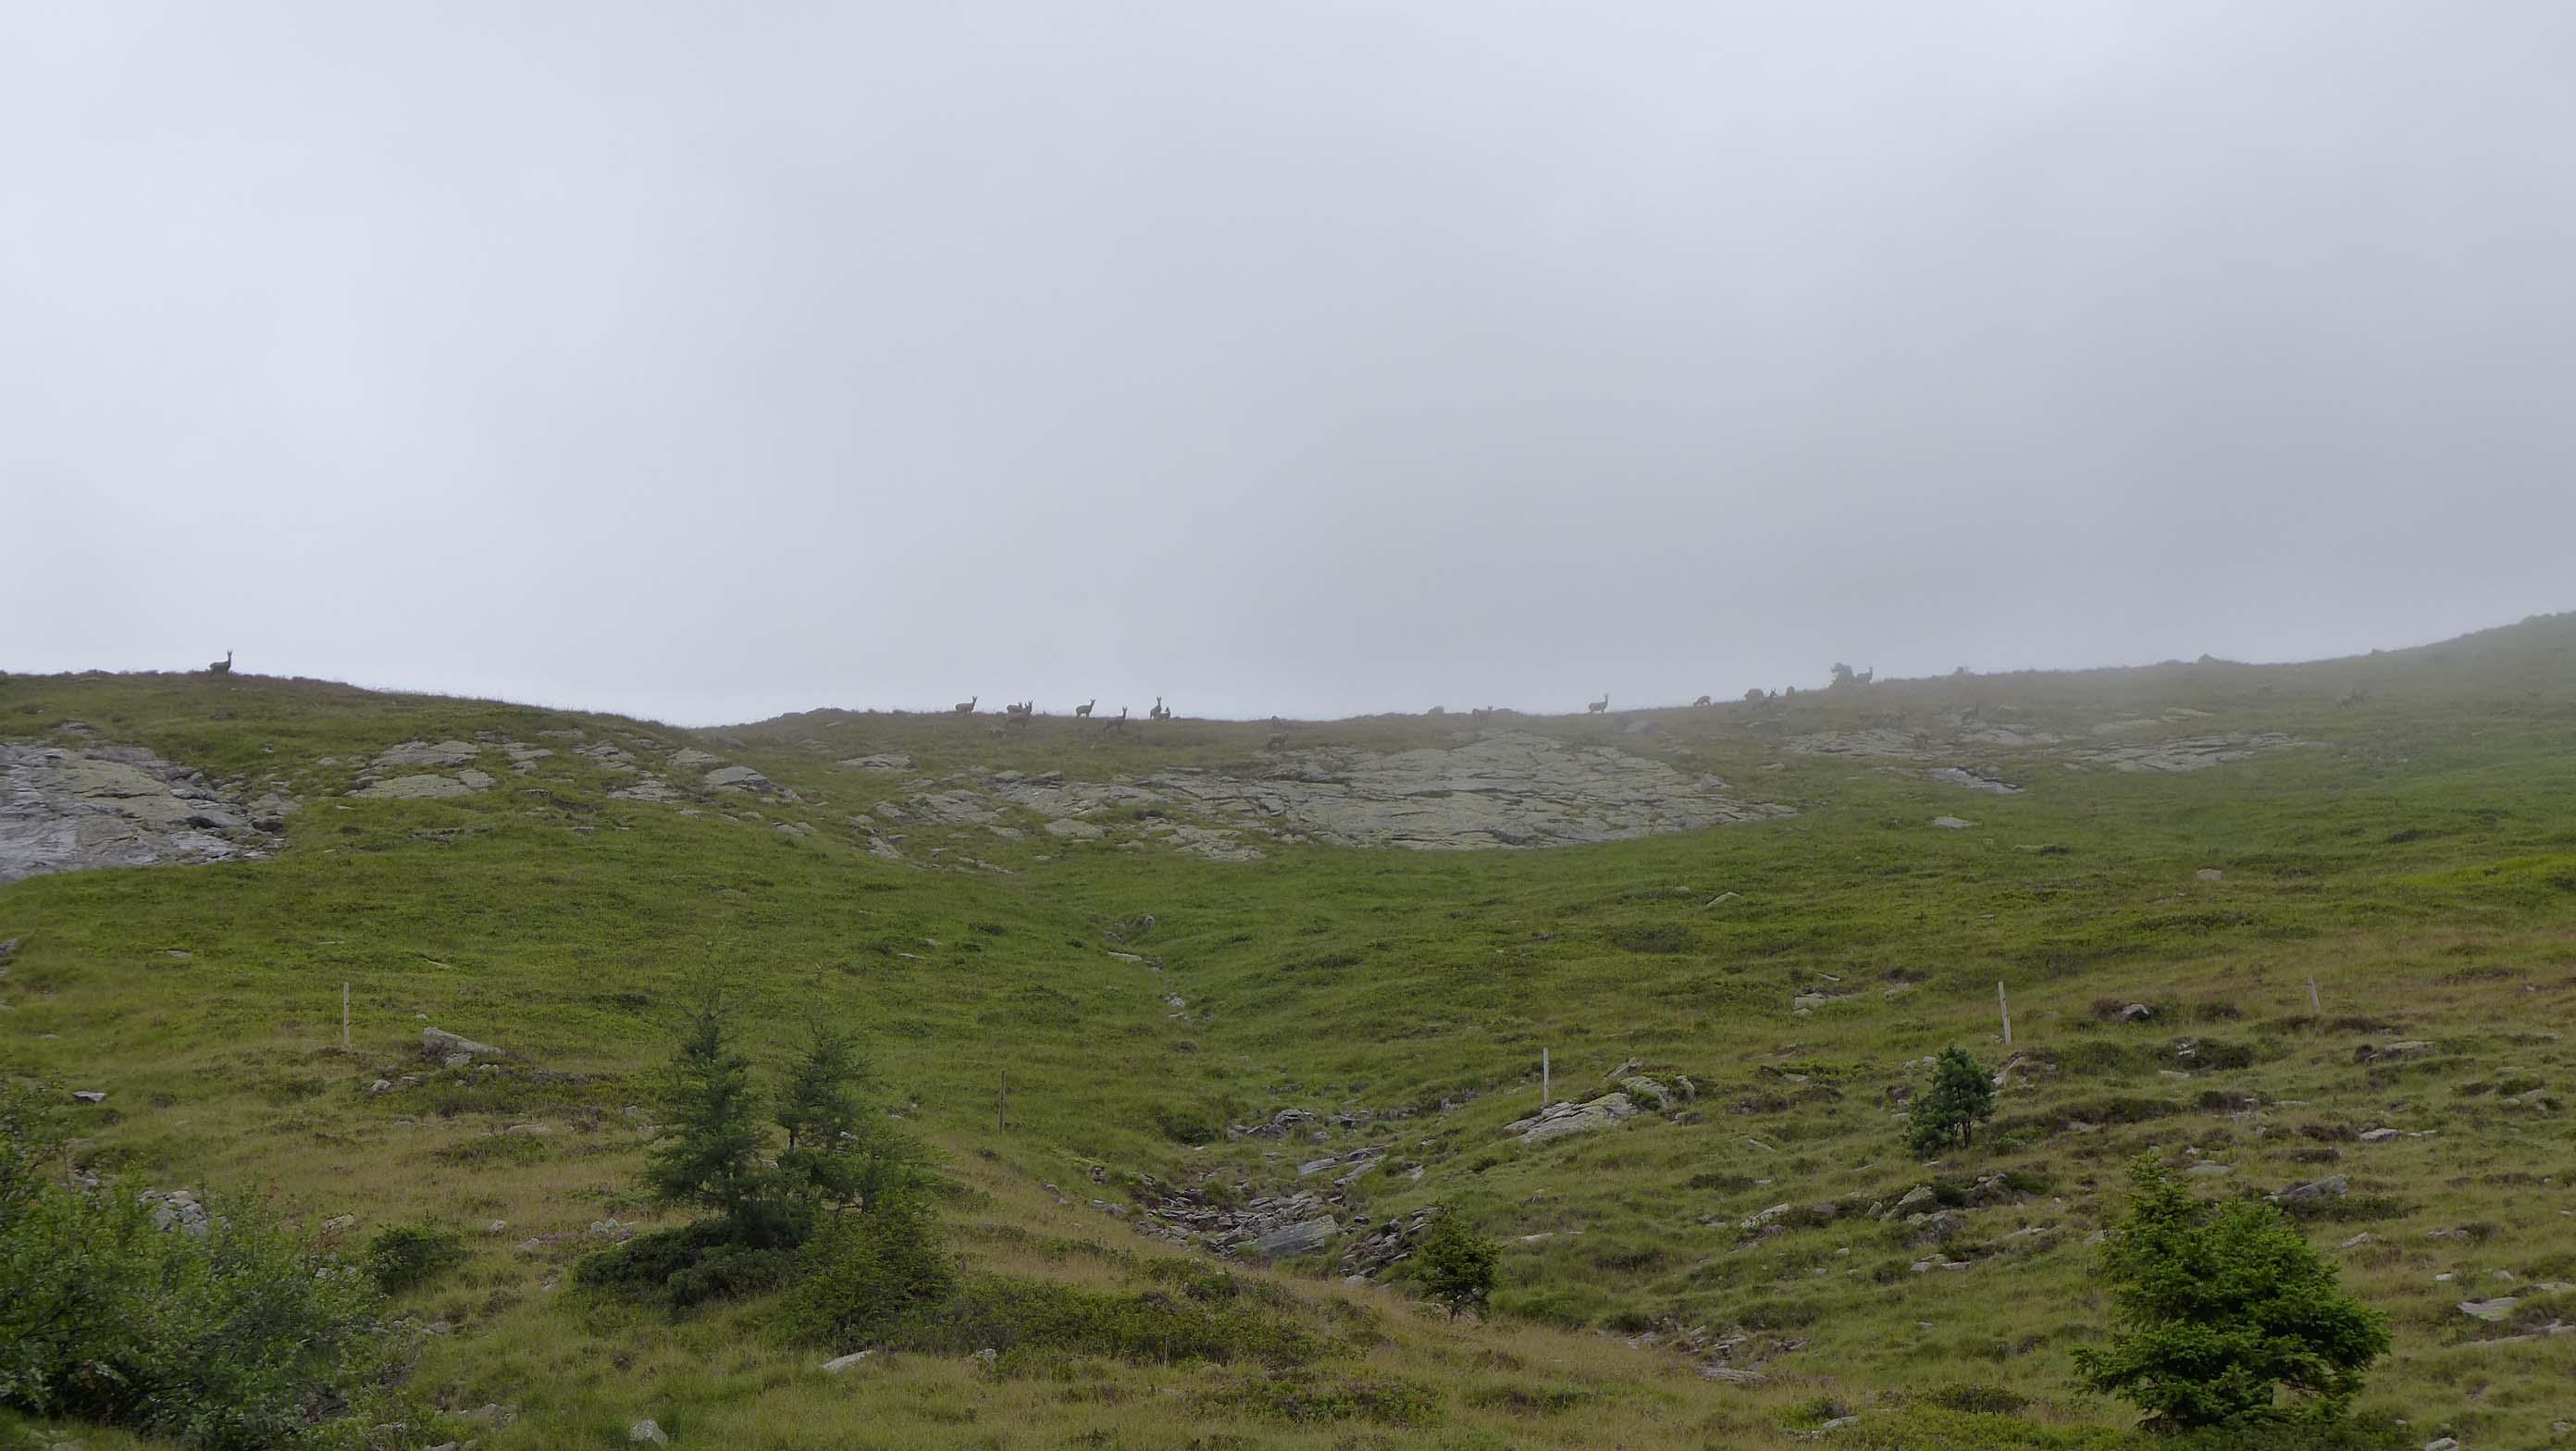 Die Silhouetten der Gämsen entlang des Bergrückens ...